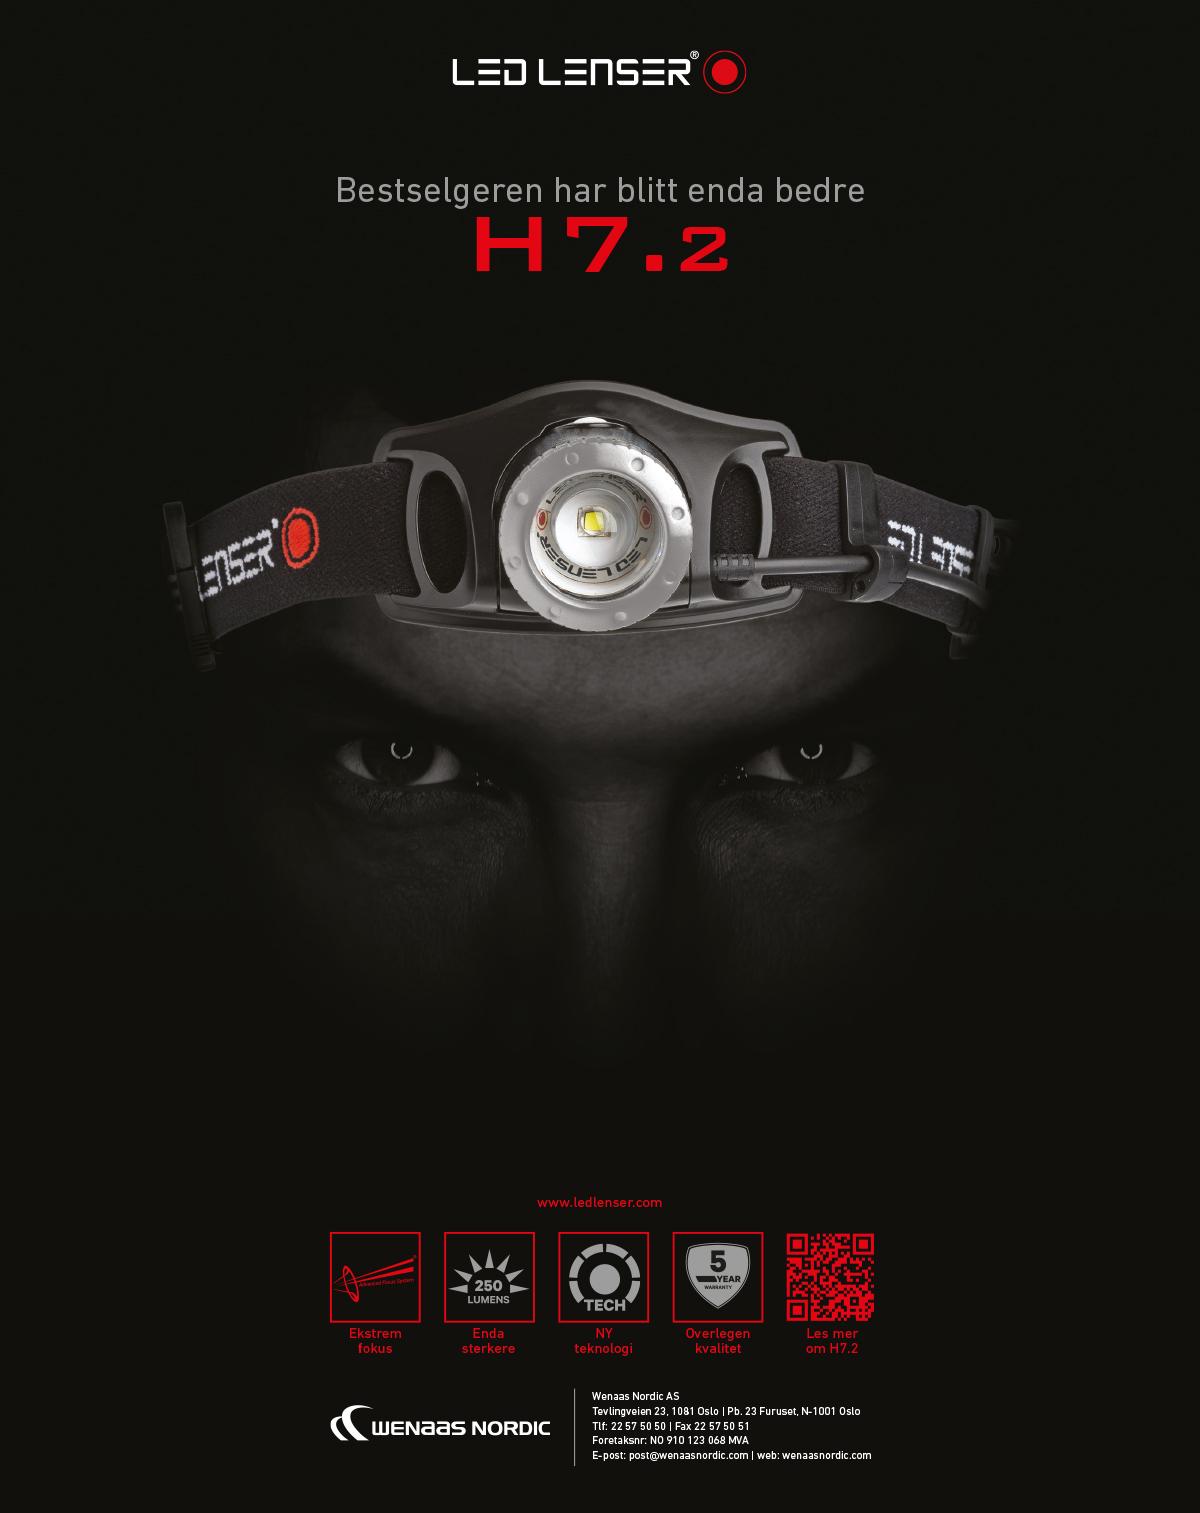 kudosmedia-annonse-ledlenser2